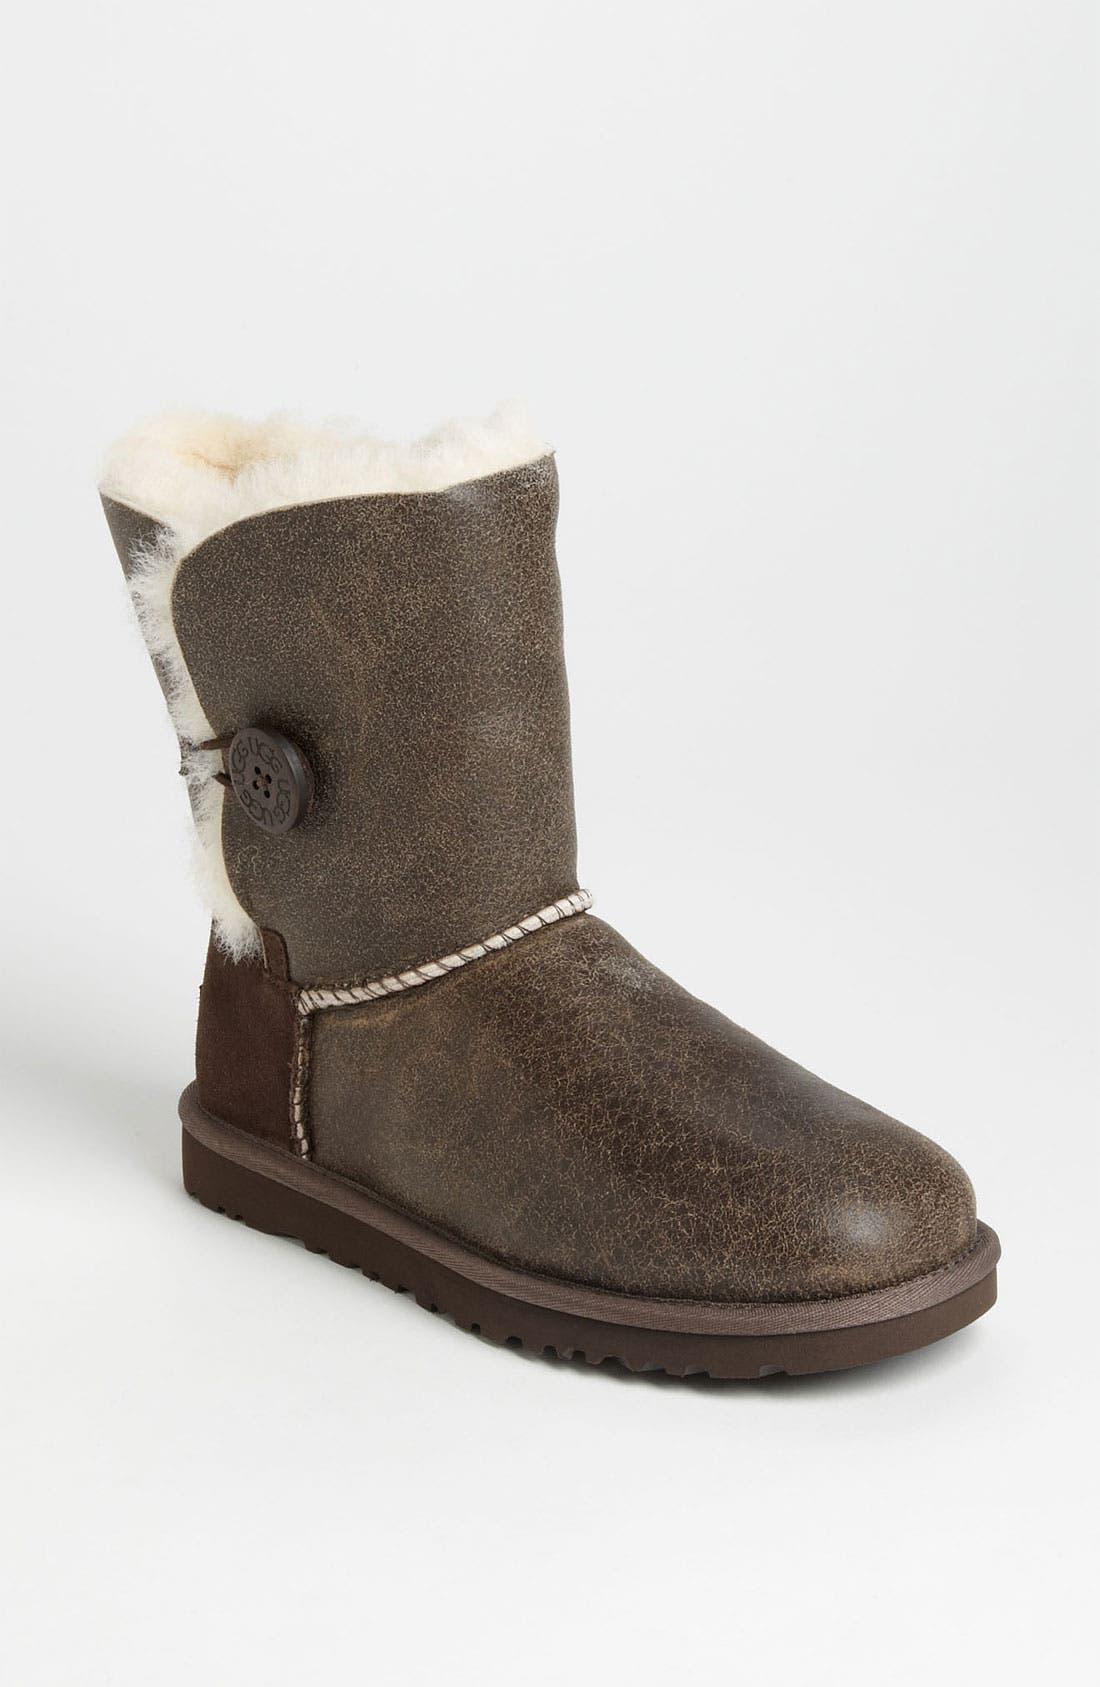 Alternate Image 1 Selected - UGG® Australia 'Bailey Button Bomber' Boot (Women)